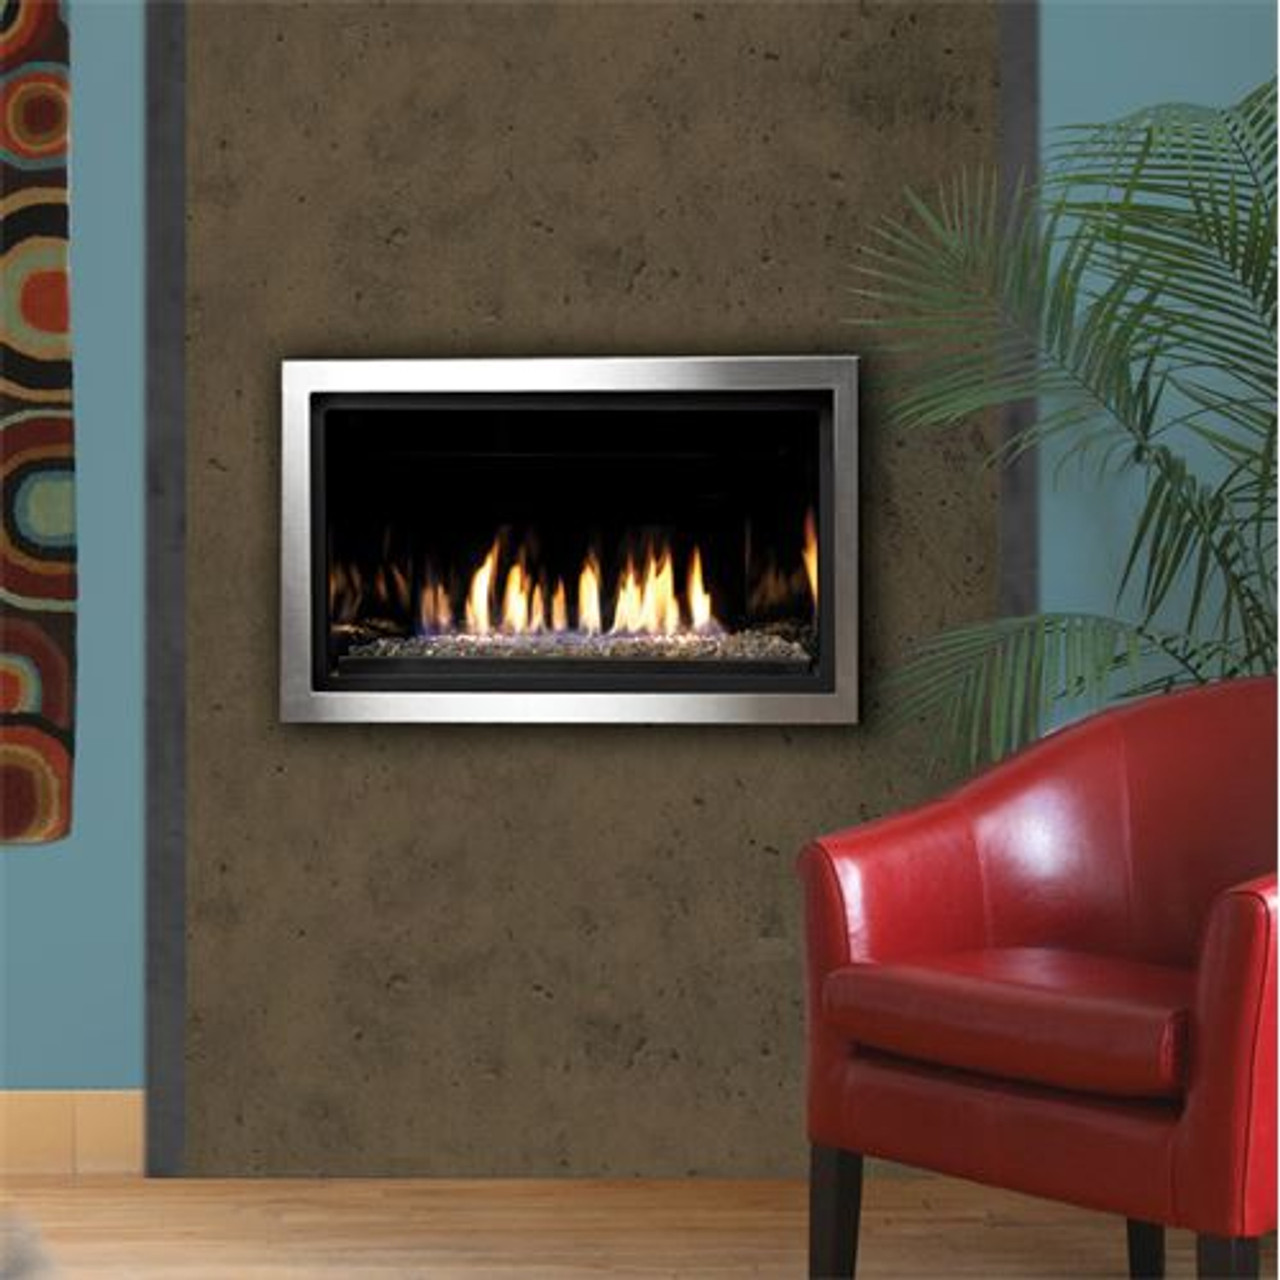 Linear Gas Fireplace >> Kingsman 36 Linear Gas Fireplace Zcvrb22n